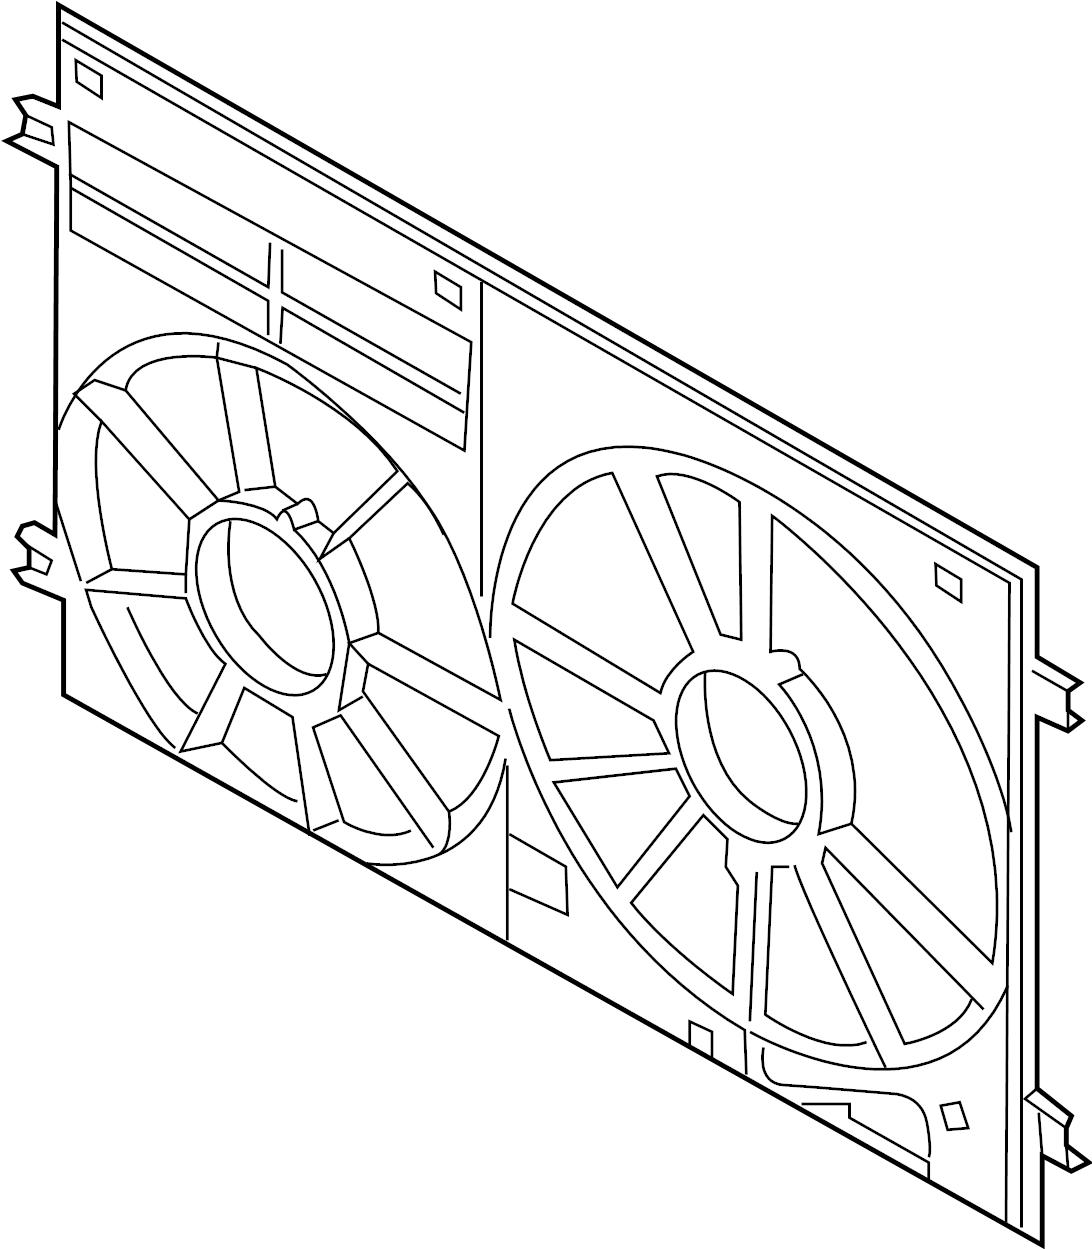 lexus diagrams   lexus rx 350 fuse panel